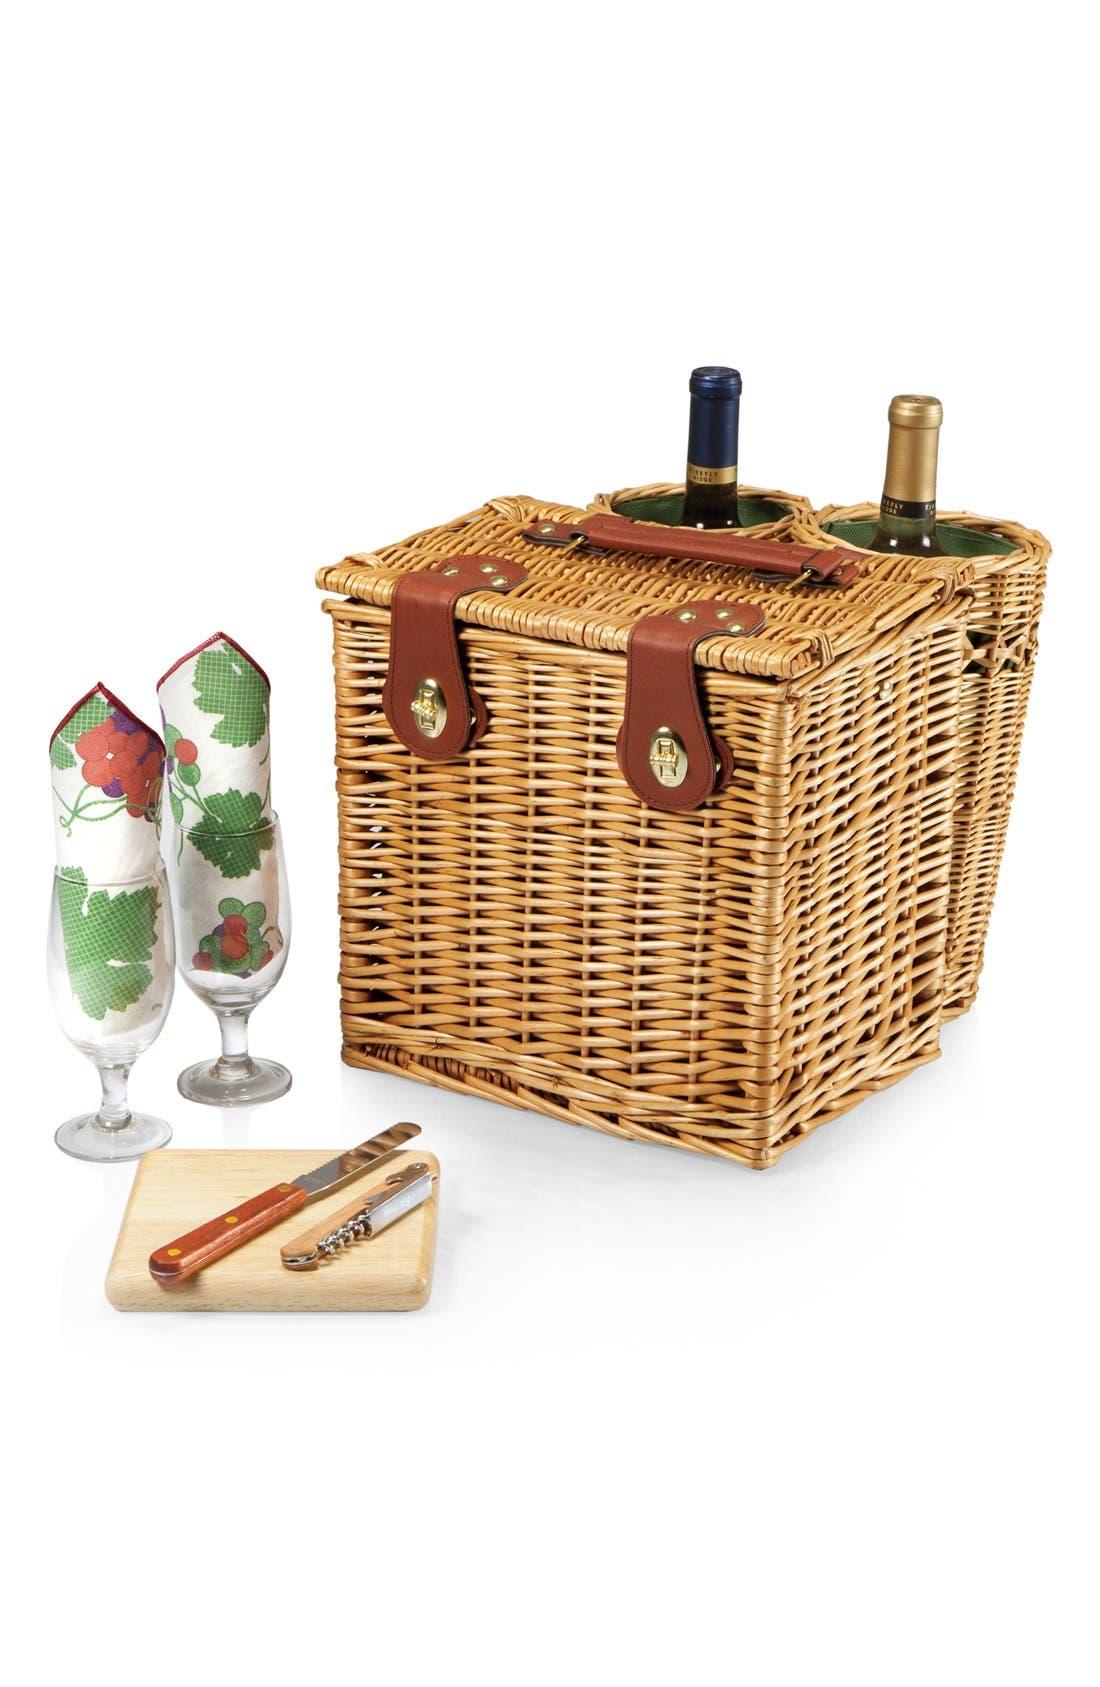 'Vino' Wine & Cheese Picnic Basket,                             Alternate thumbnail 4, color,                             300